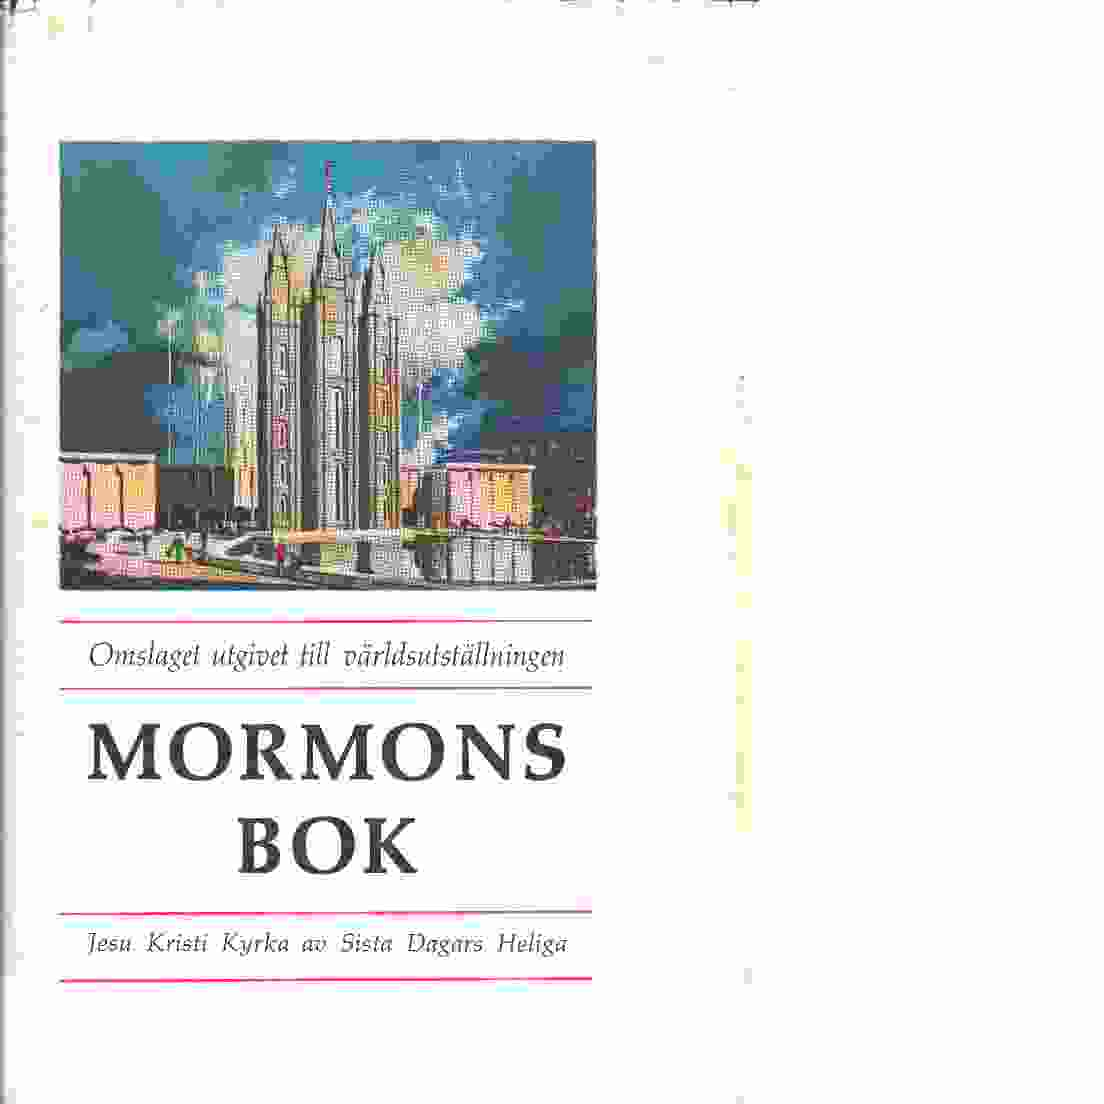 Mormons bok - Red. Smith, Joseph